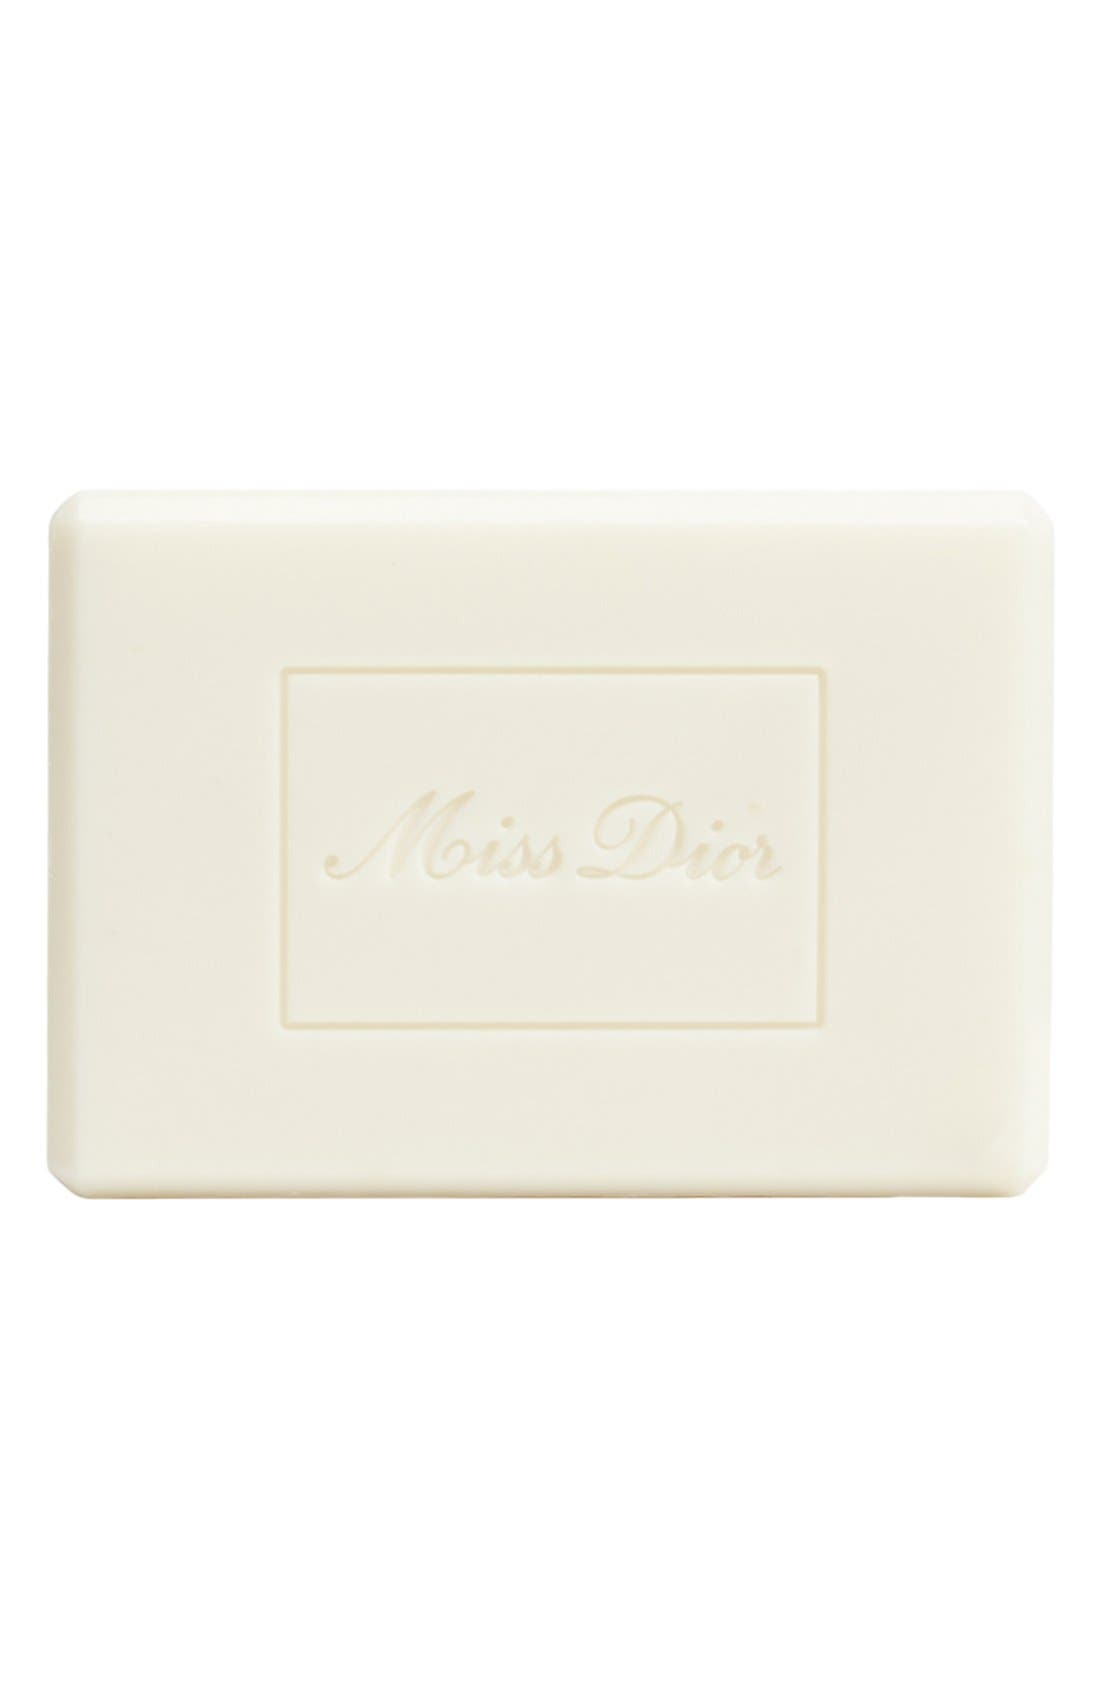 Dior 'Miss Dior' Silky Soap